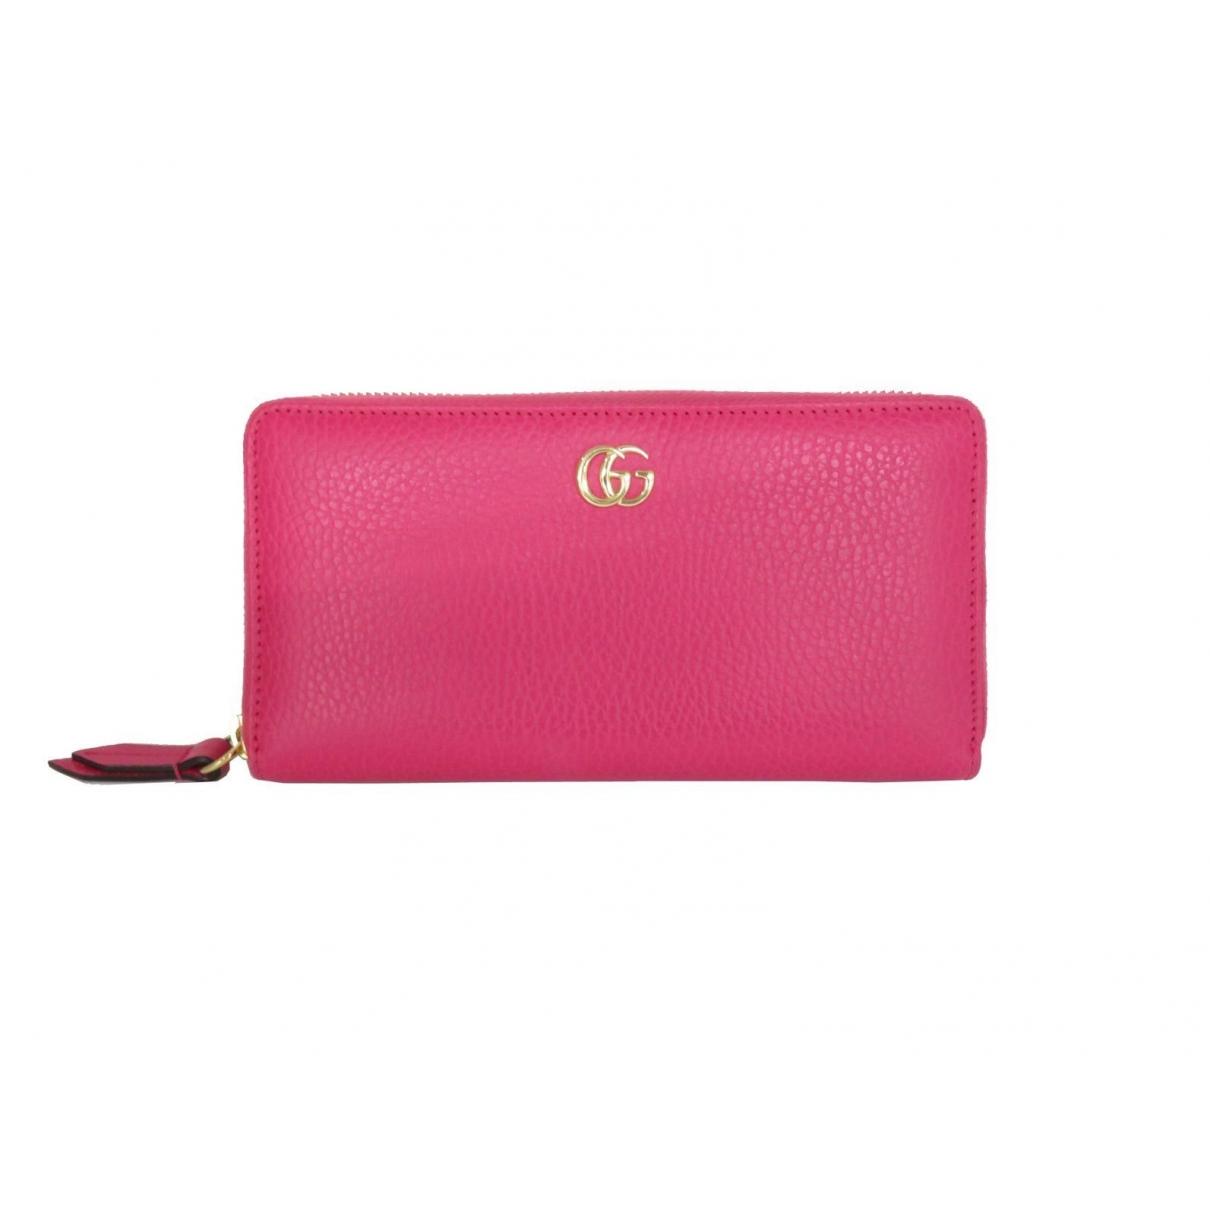 Gucci Marmont Portemonnaie in  Rosa Leder